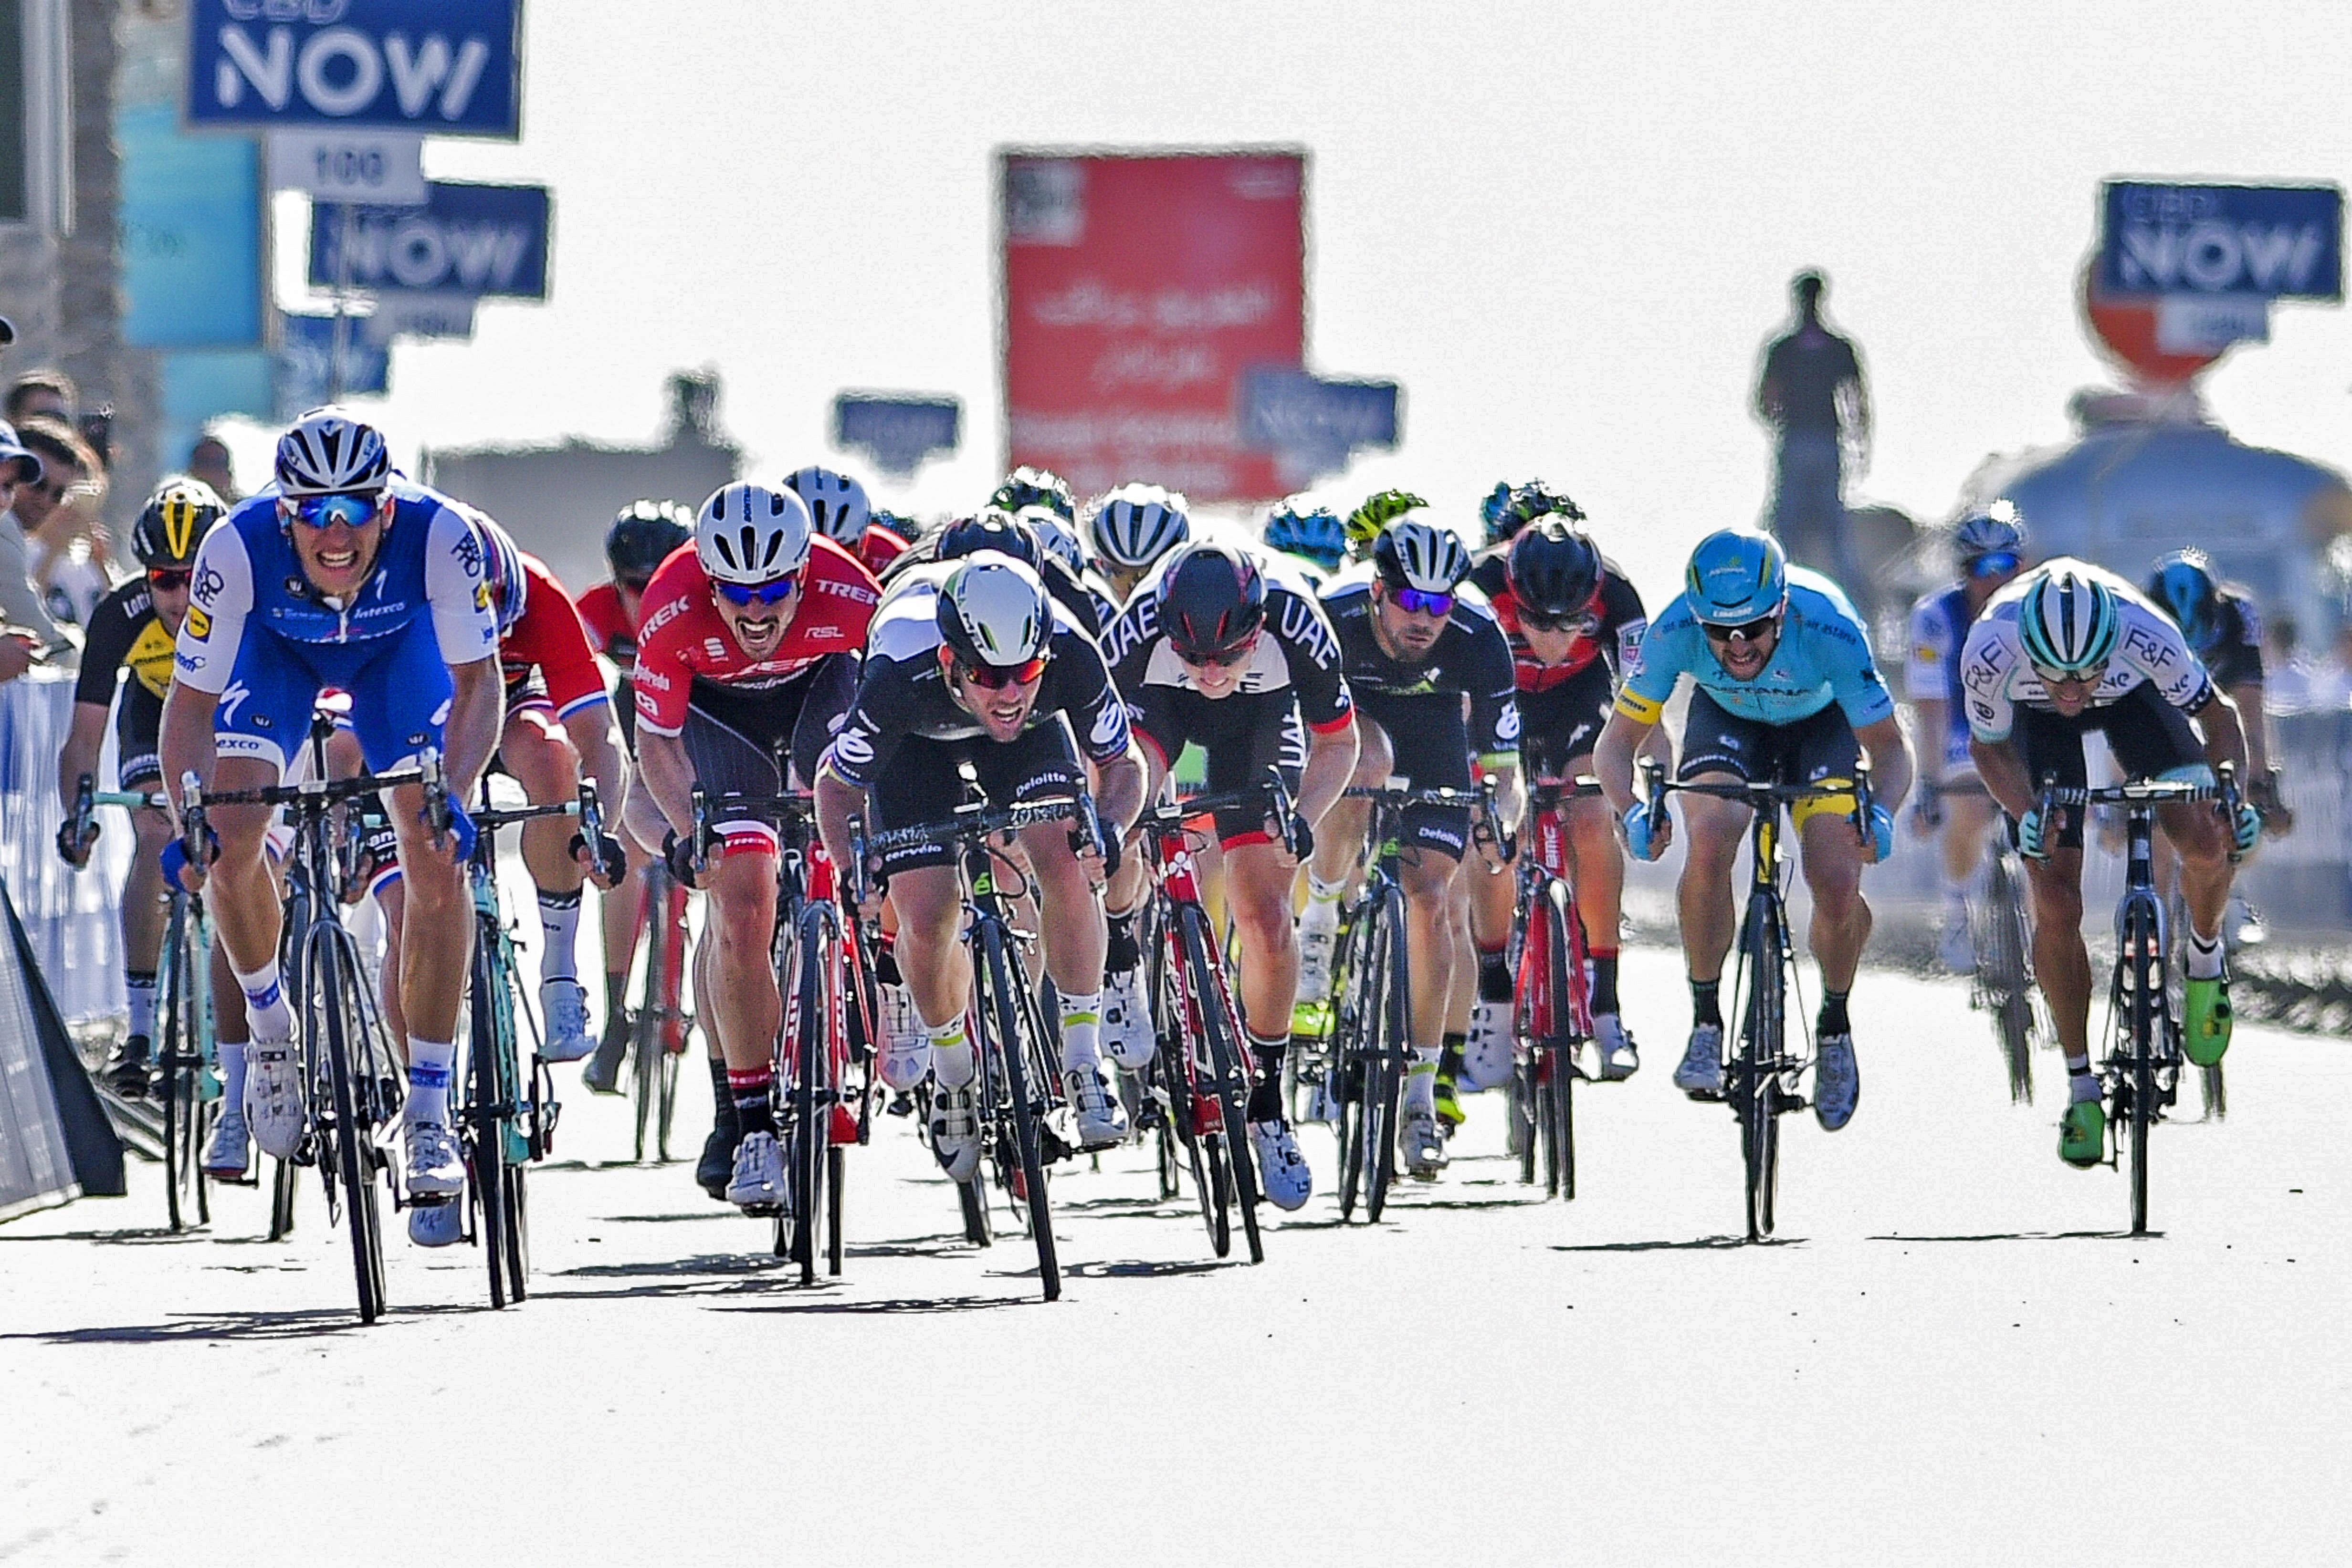 Cycling Sprint Feature 2017: Kittel, Degenkolb, Cavendish